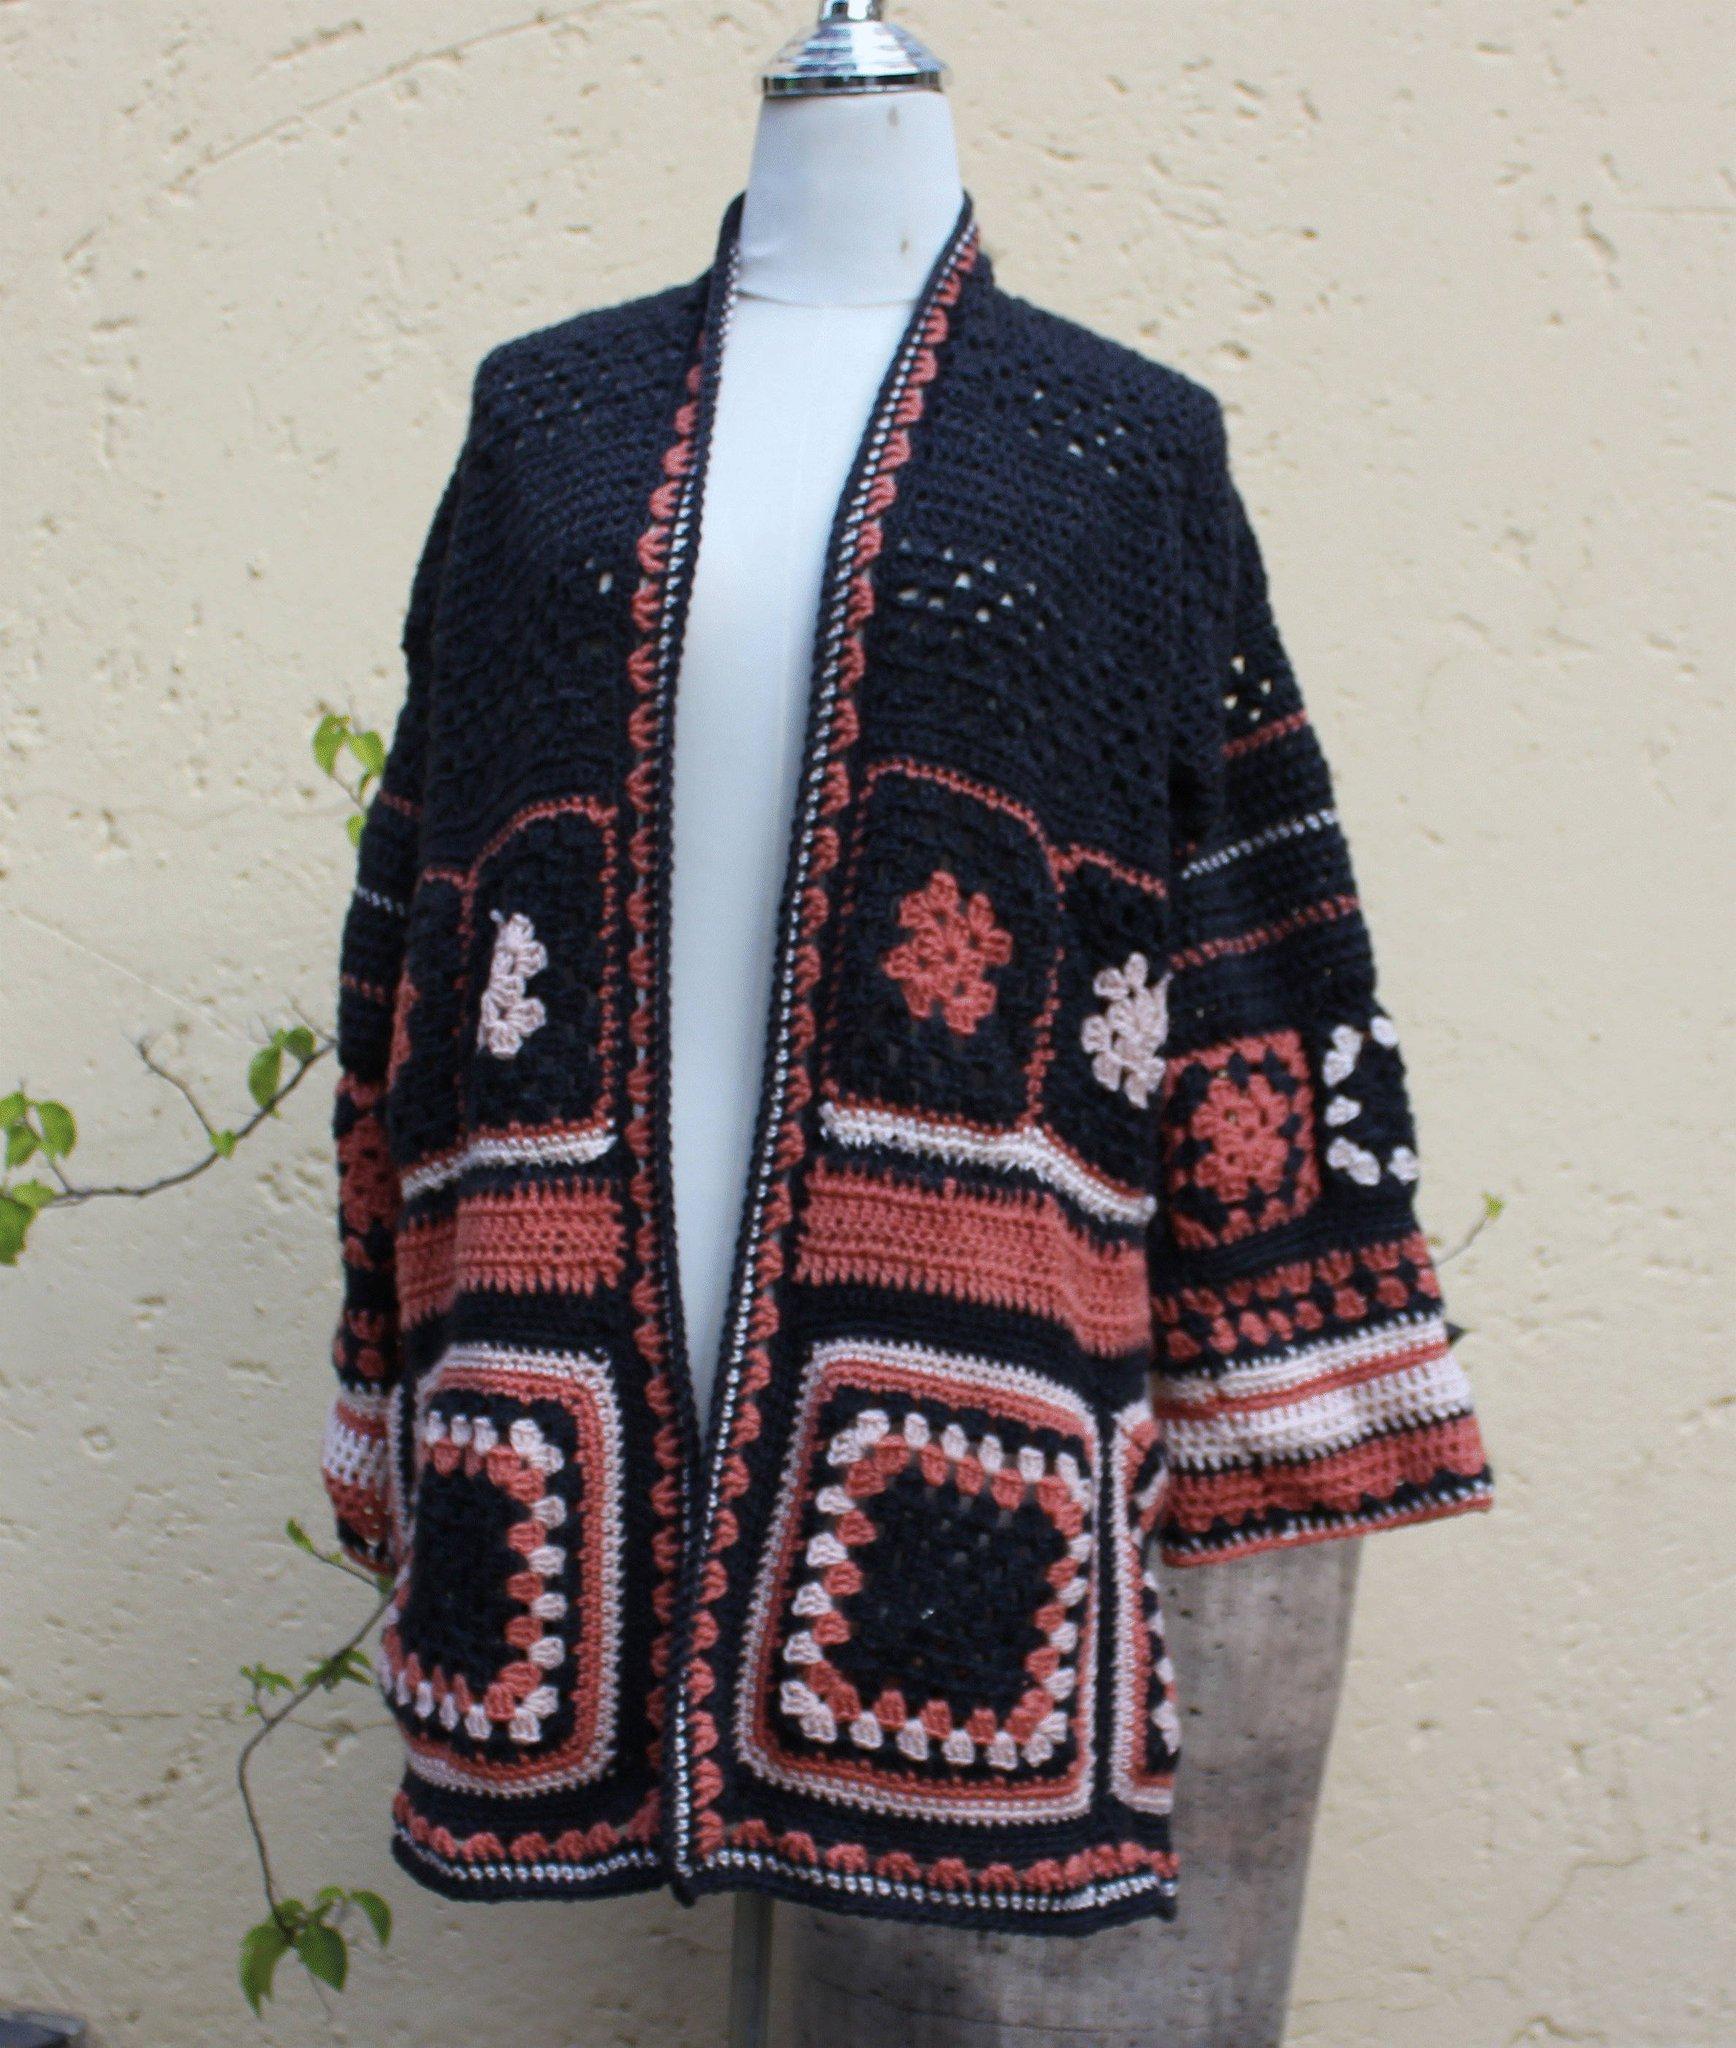 Navy Blue Crocheted Boho Duster,Long Granny Square Coat,Hippie Style Granny Square Coat,Ladies Winter Coat,Patchwork Long Coat